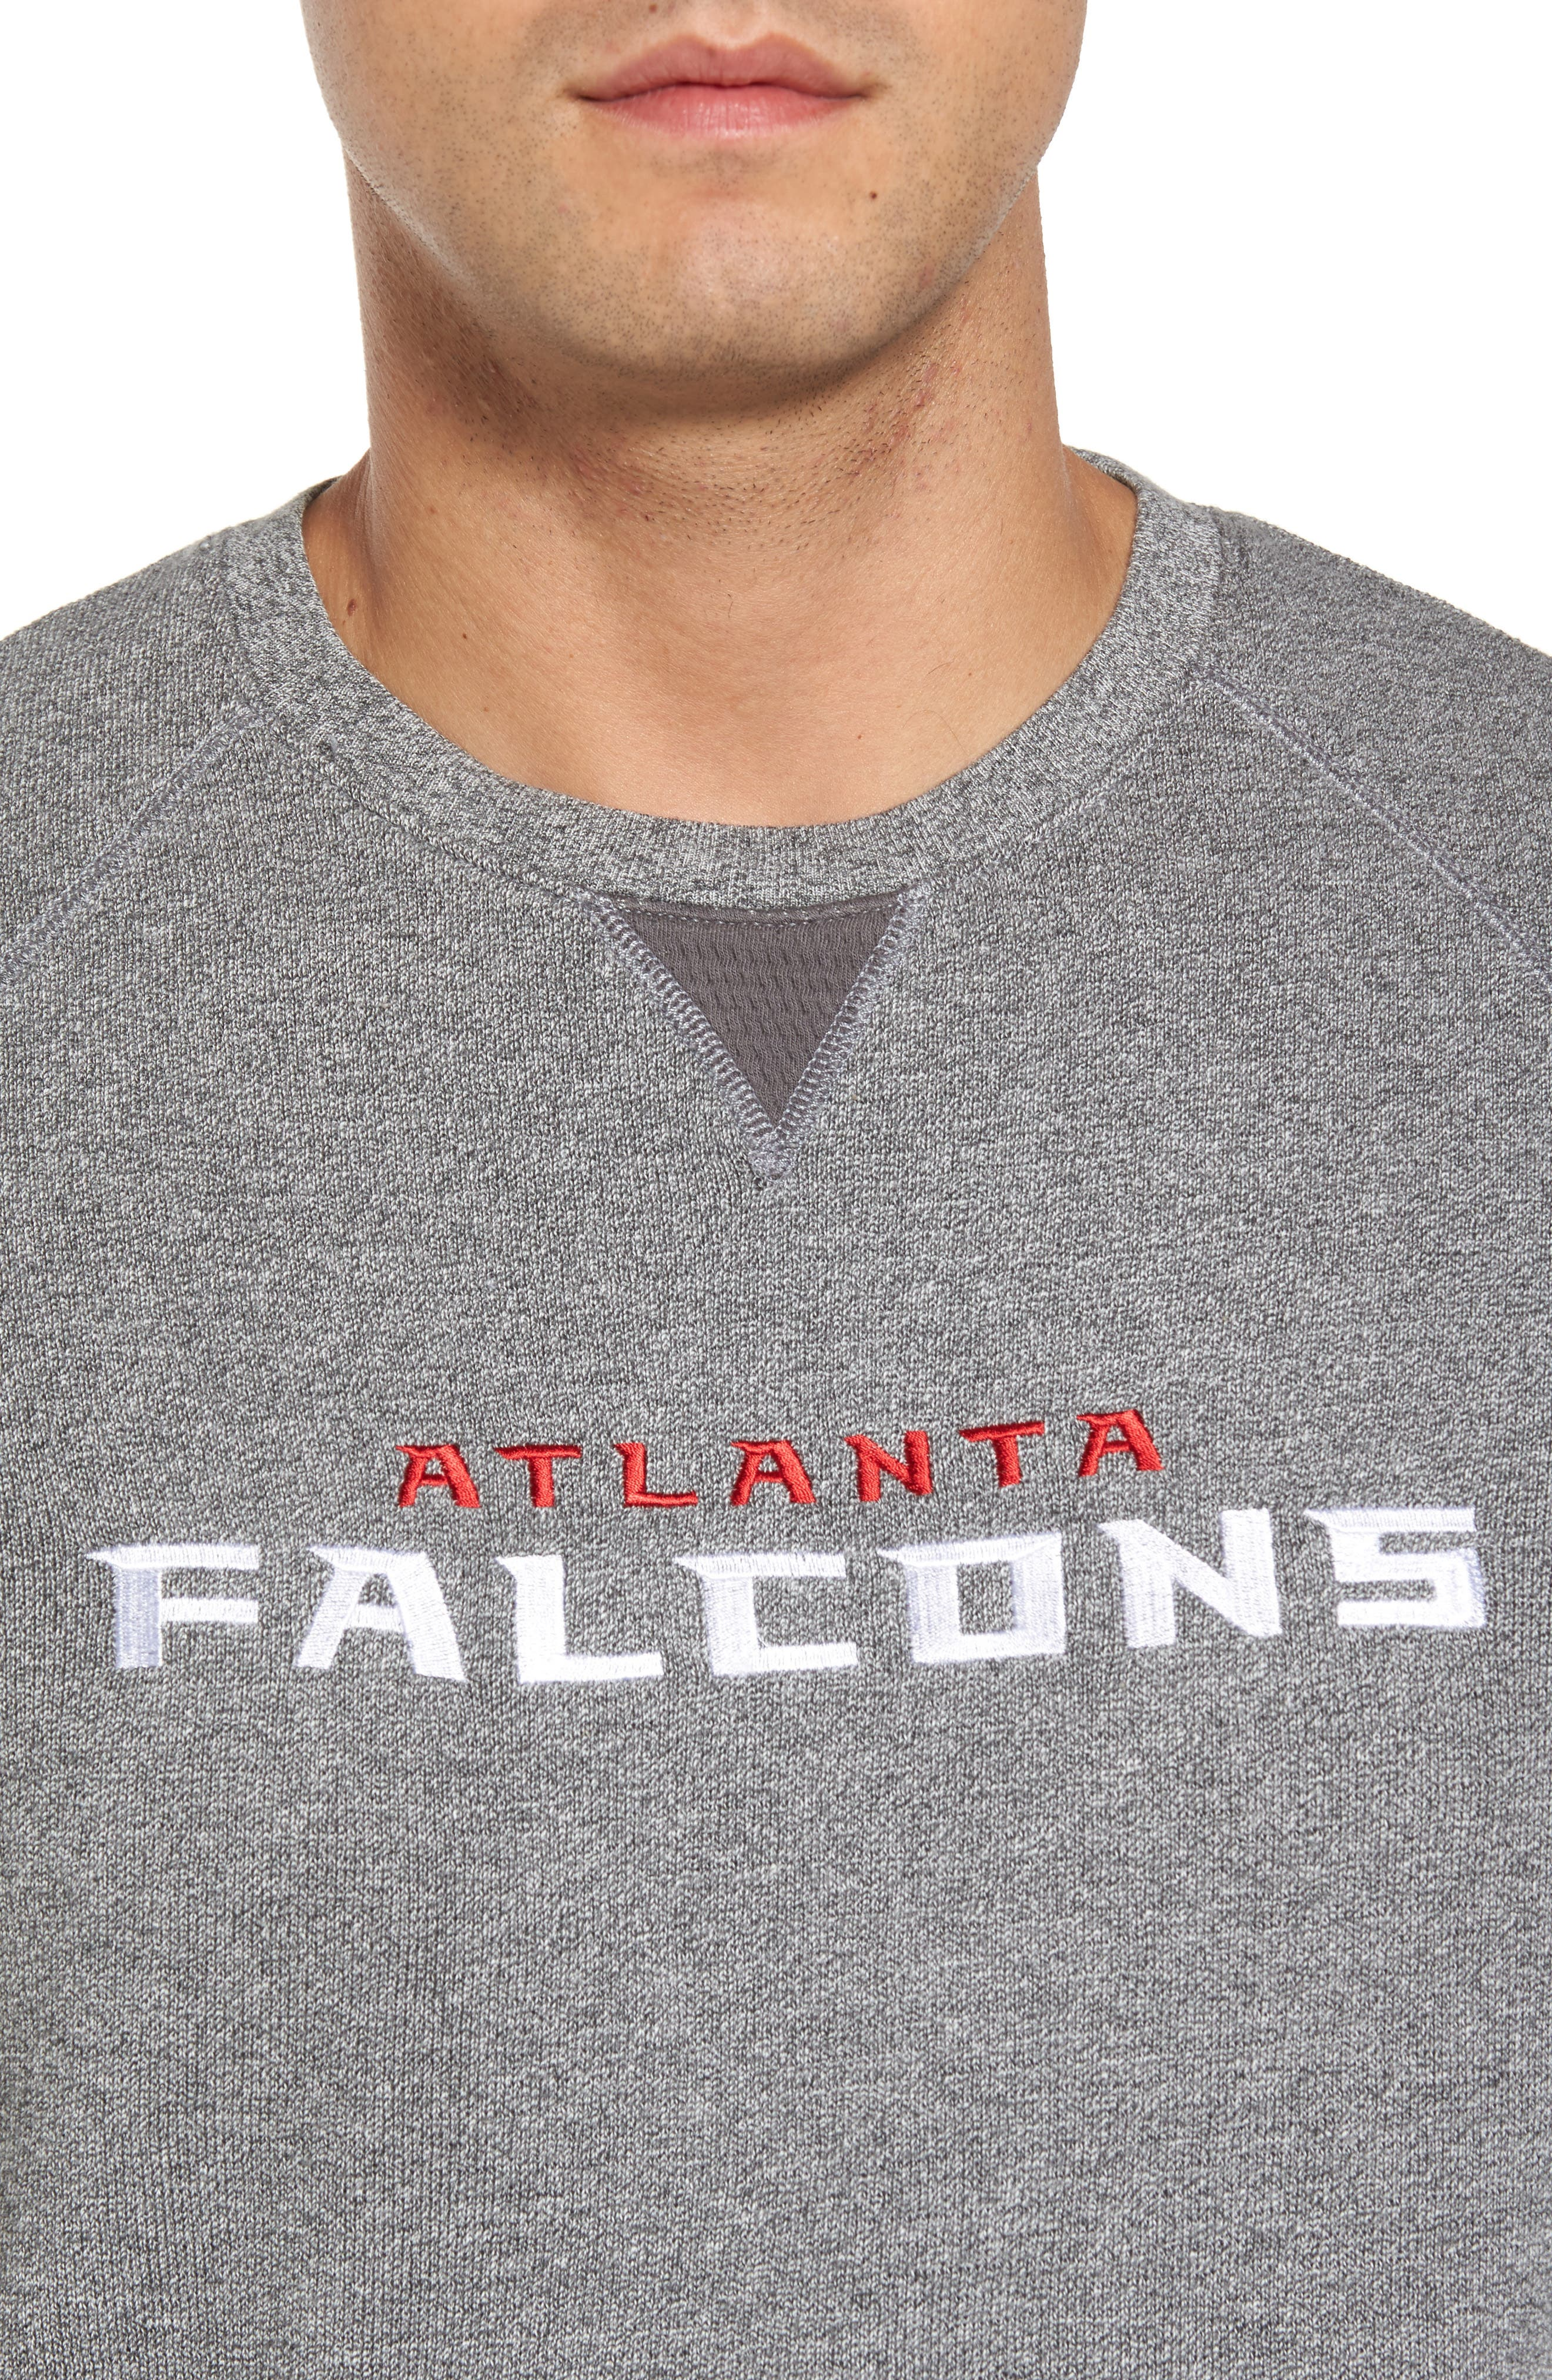 NFL Stitch of Liberty Embroidered Crewneck Sweatshirt,                             Alternate thumbnail 107, color,